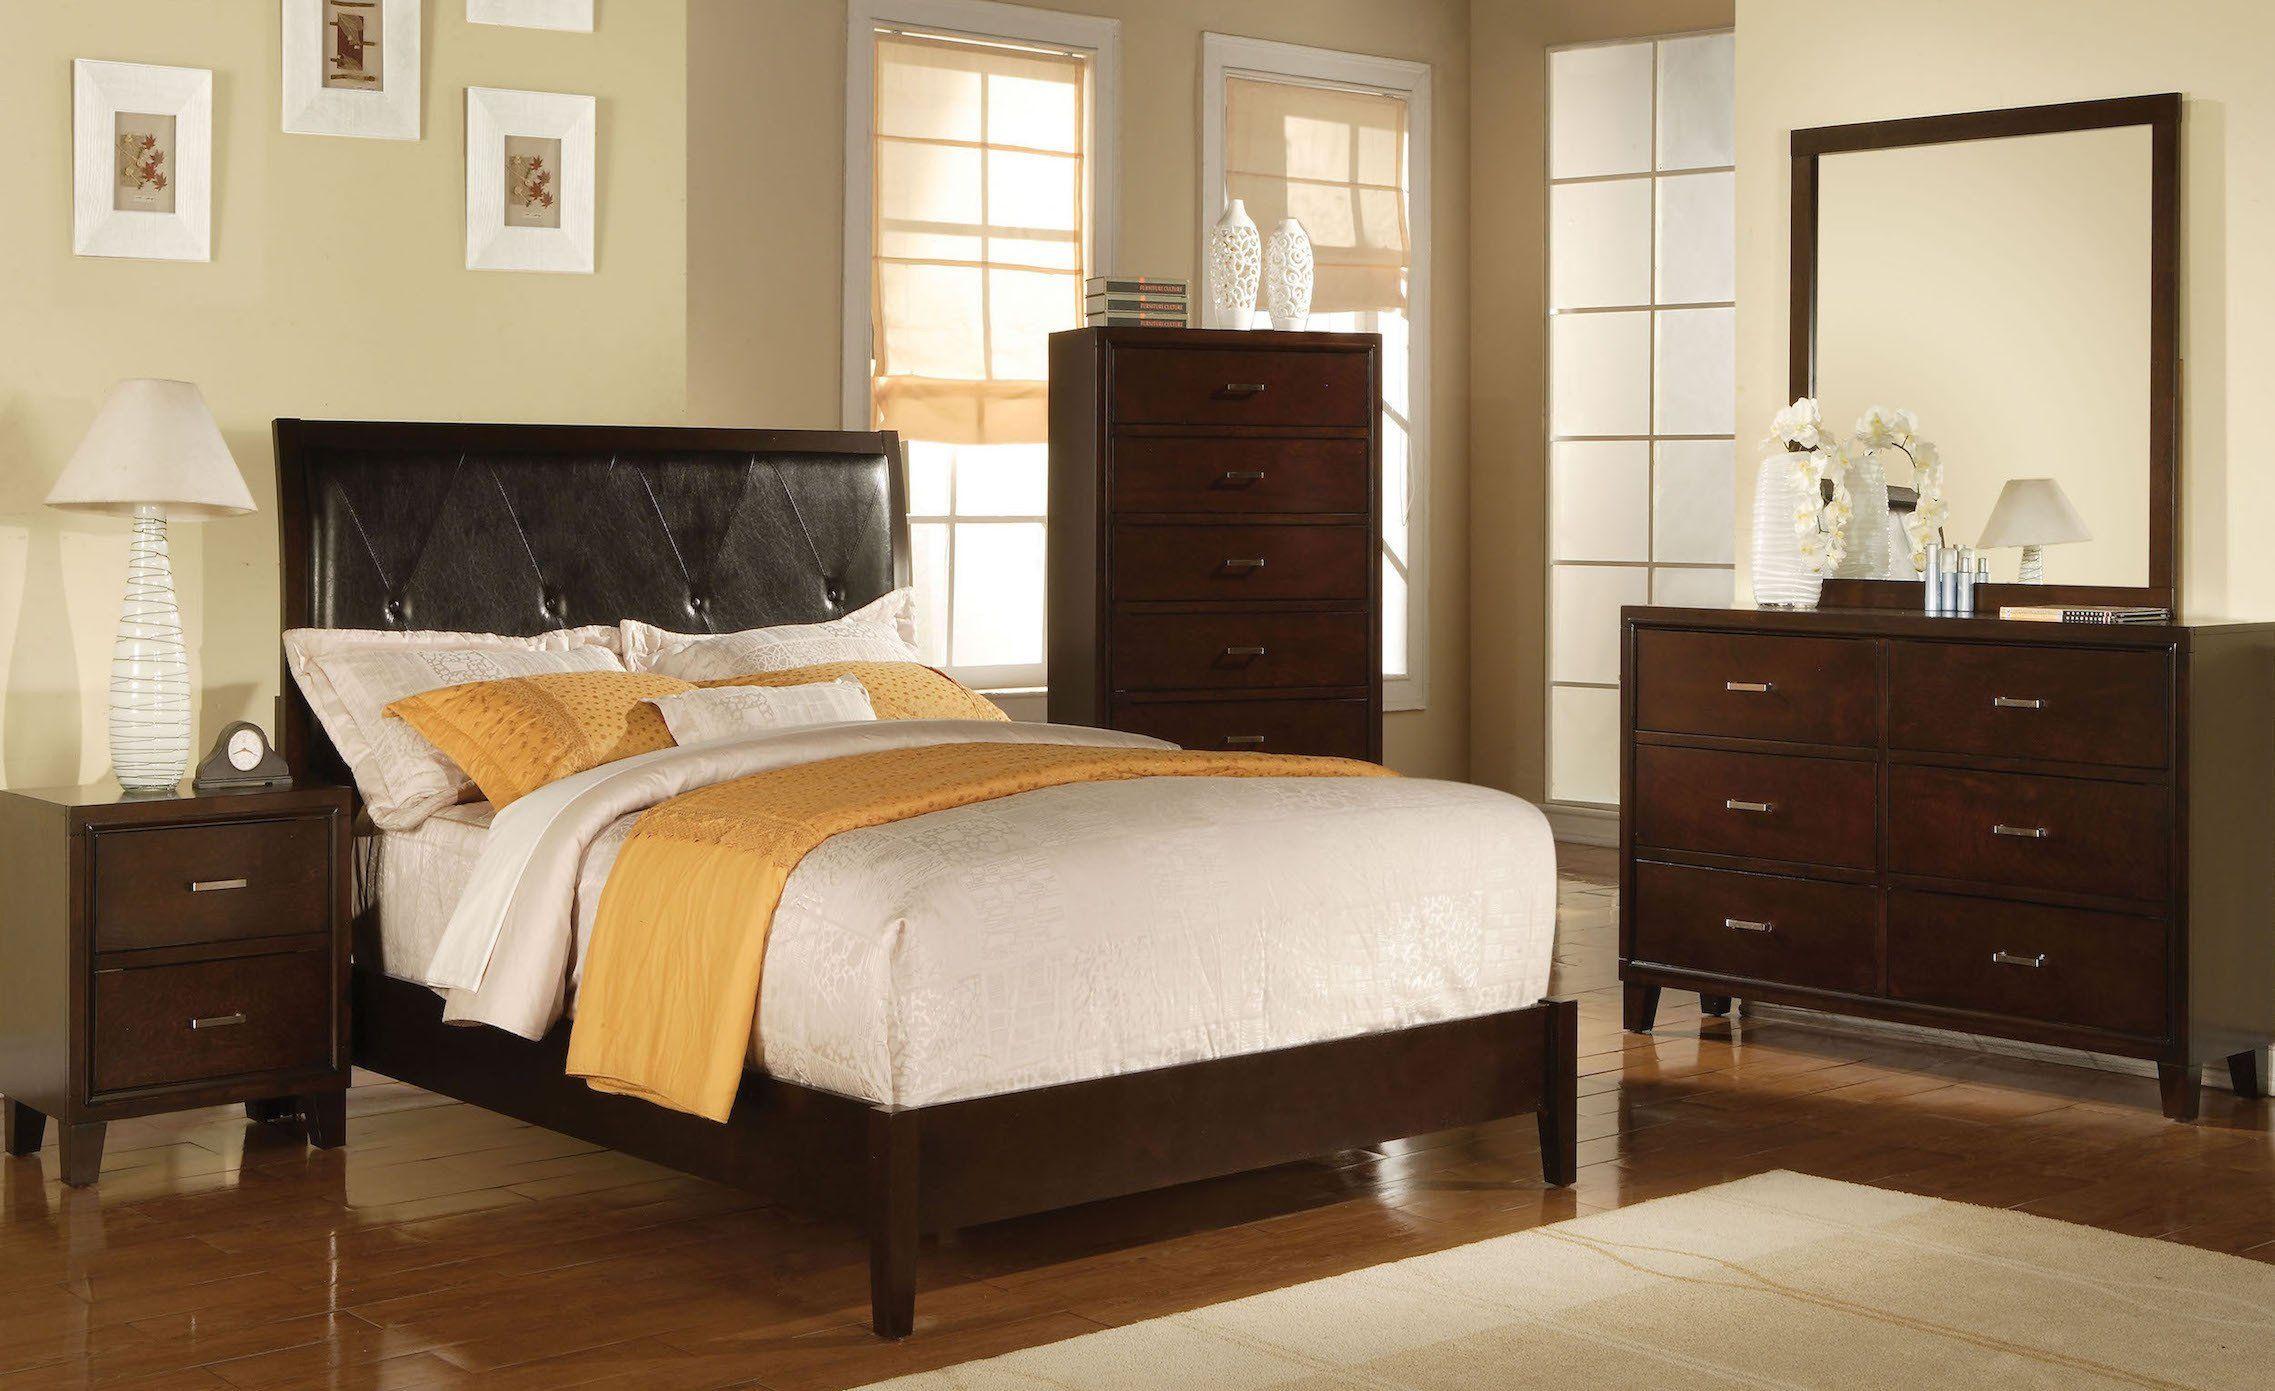 bedroom set san diego quality sofas mattresses  furniture